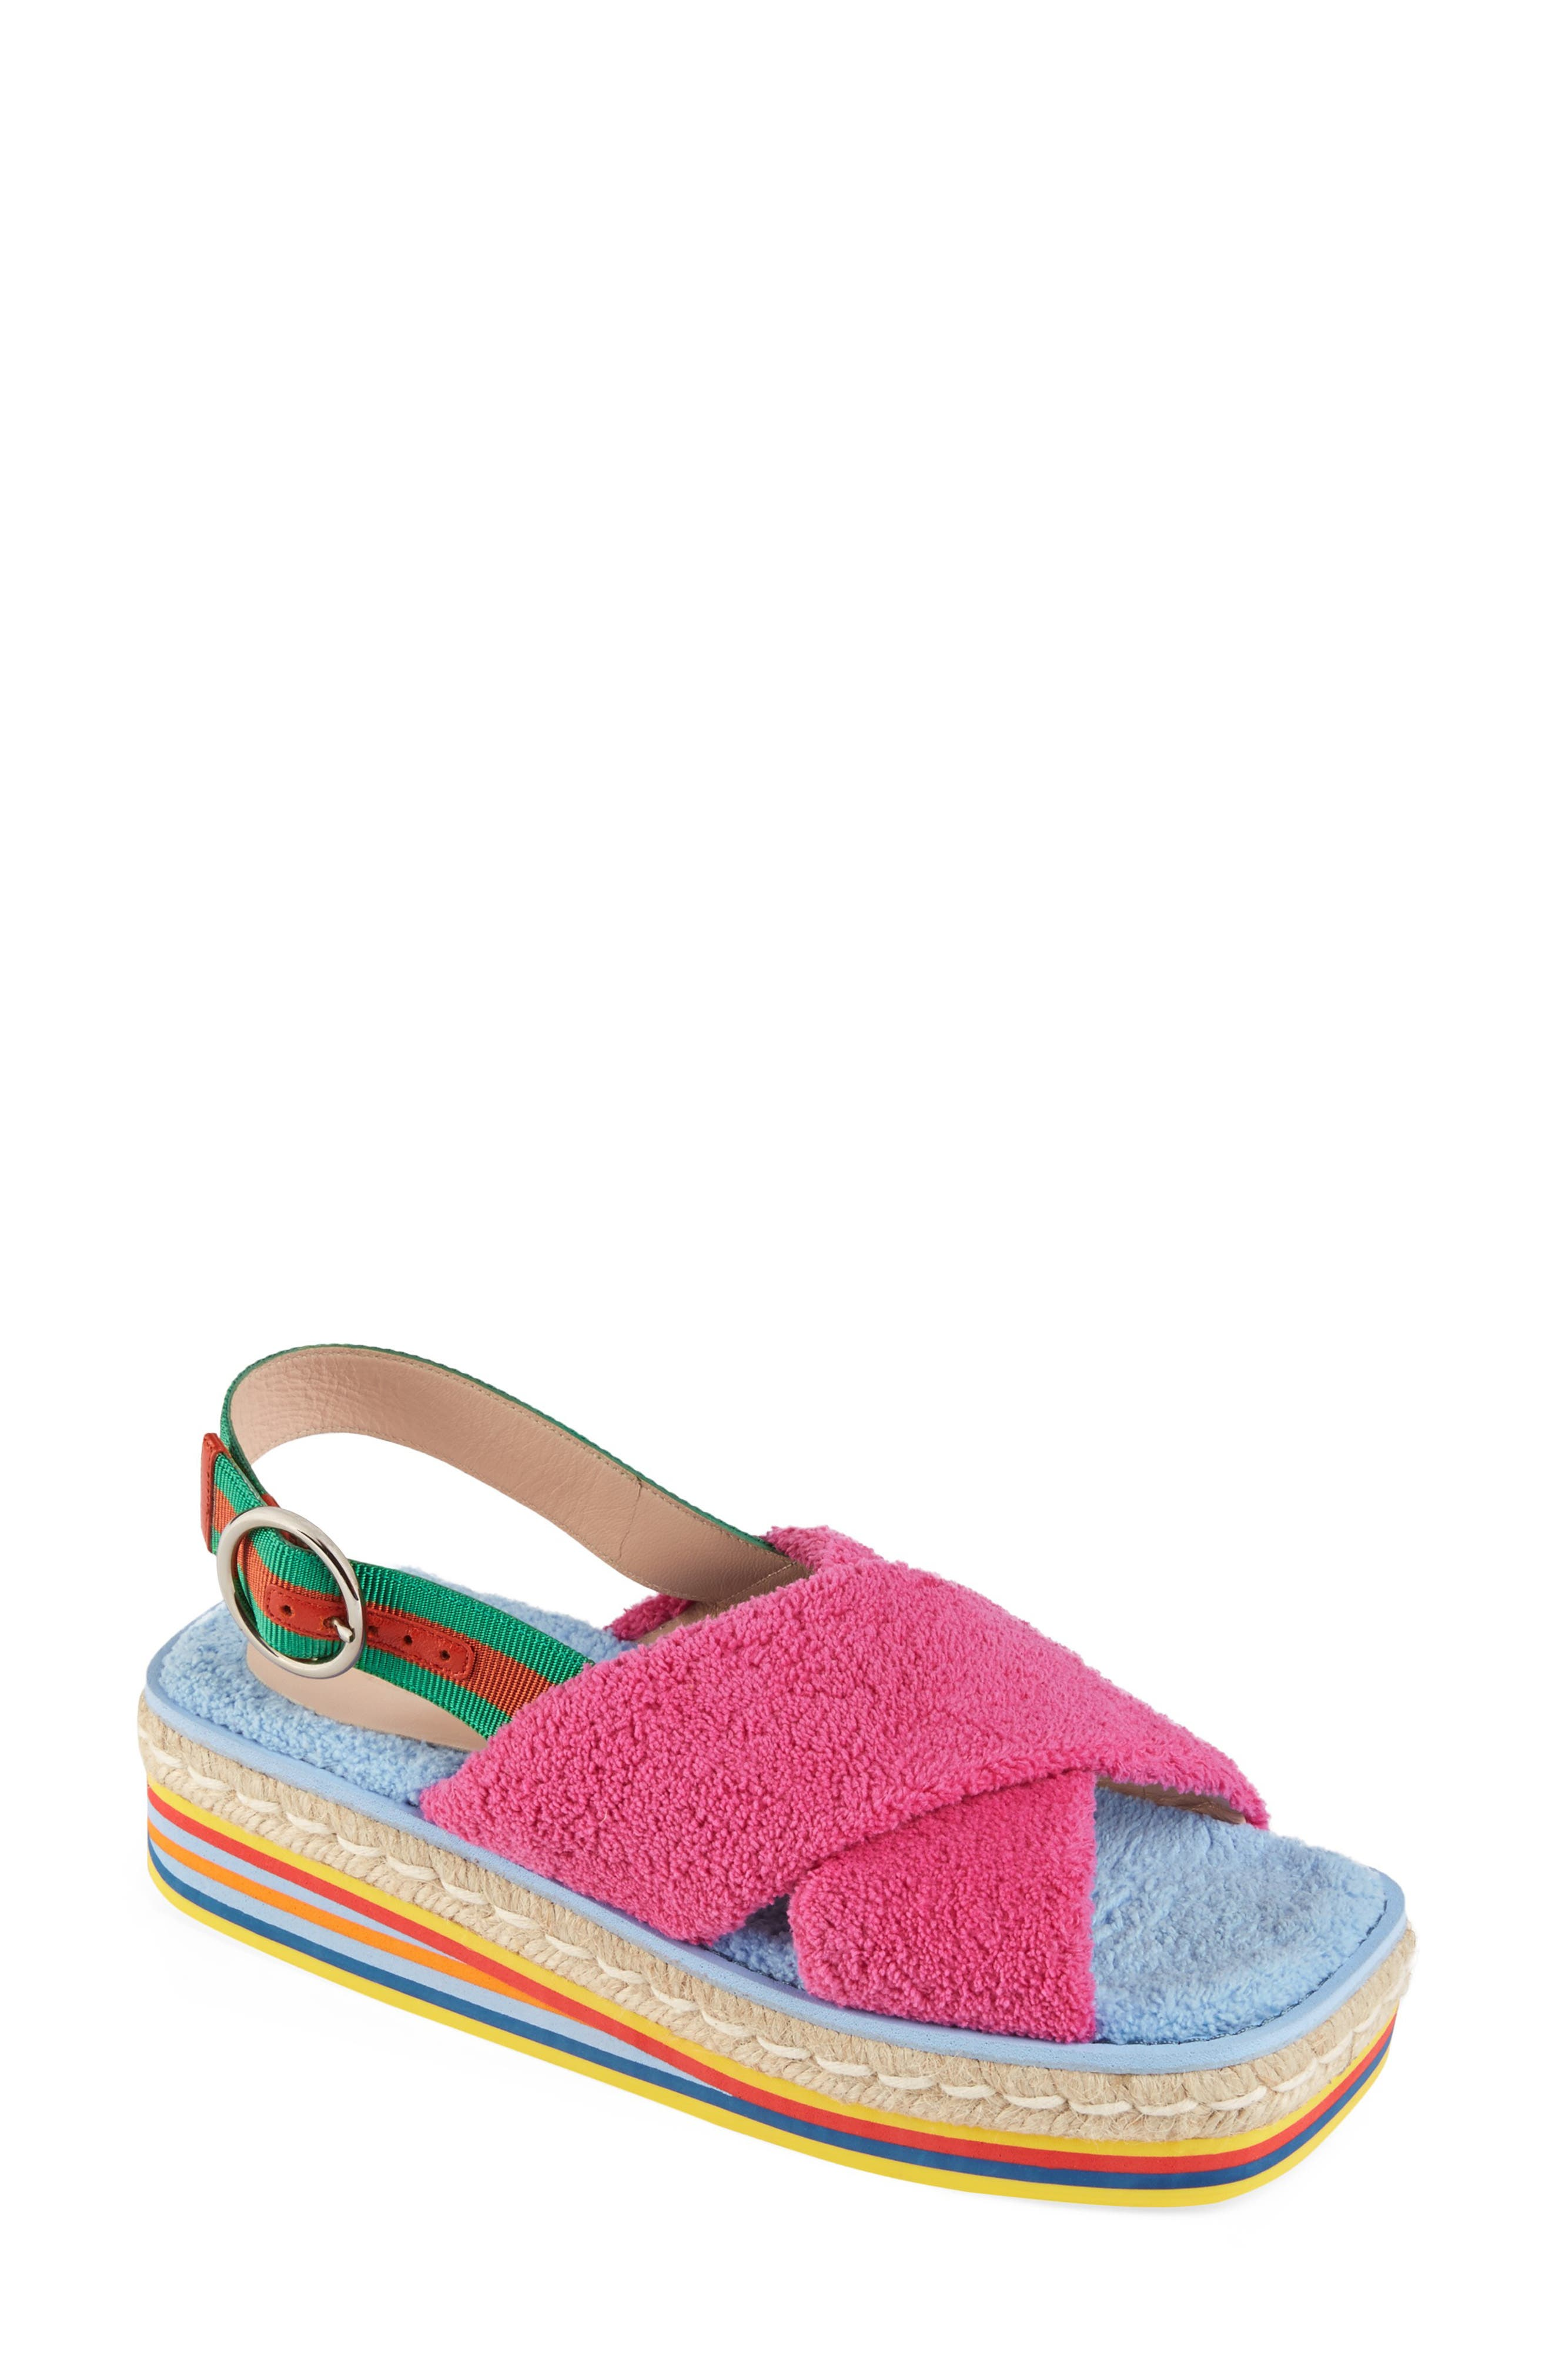 Gucci Slippers Huma Slingback Sandal